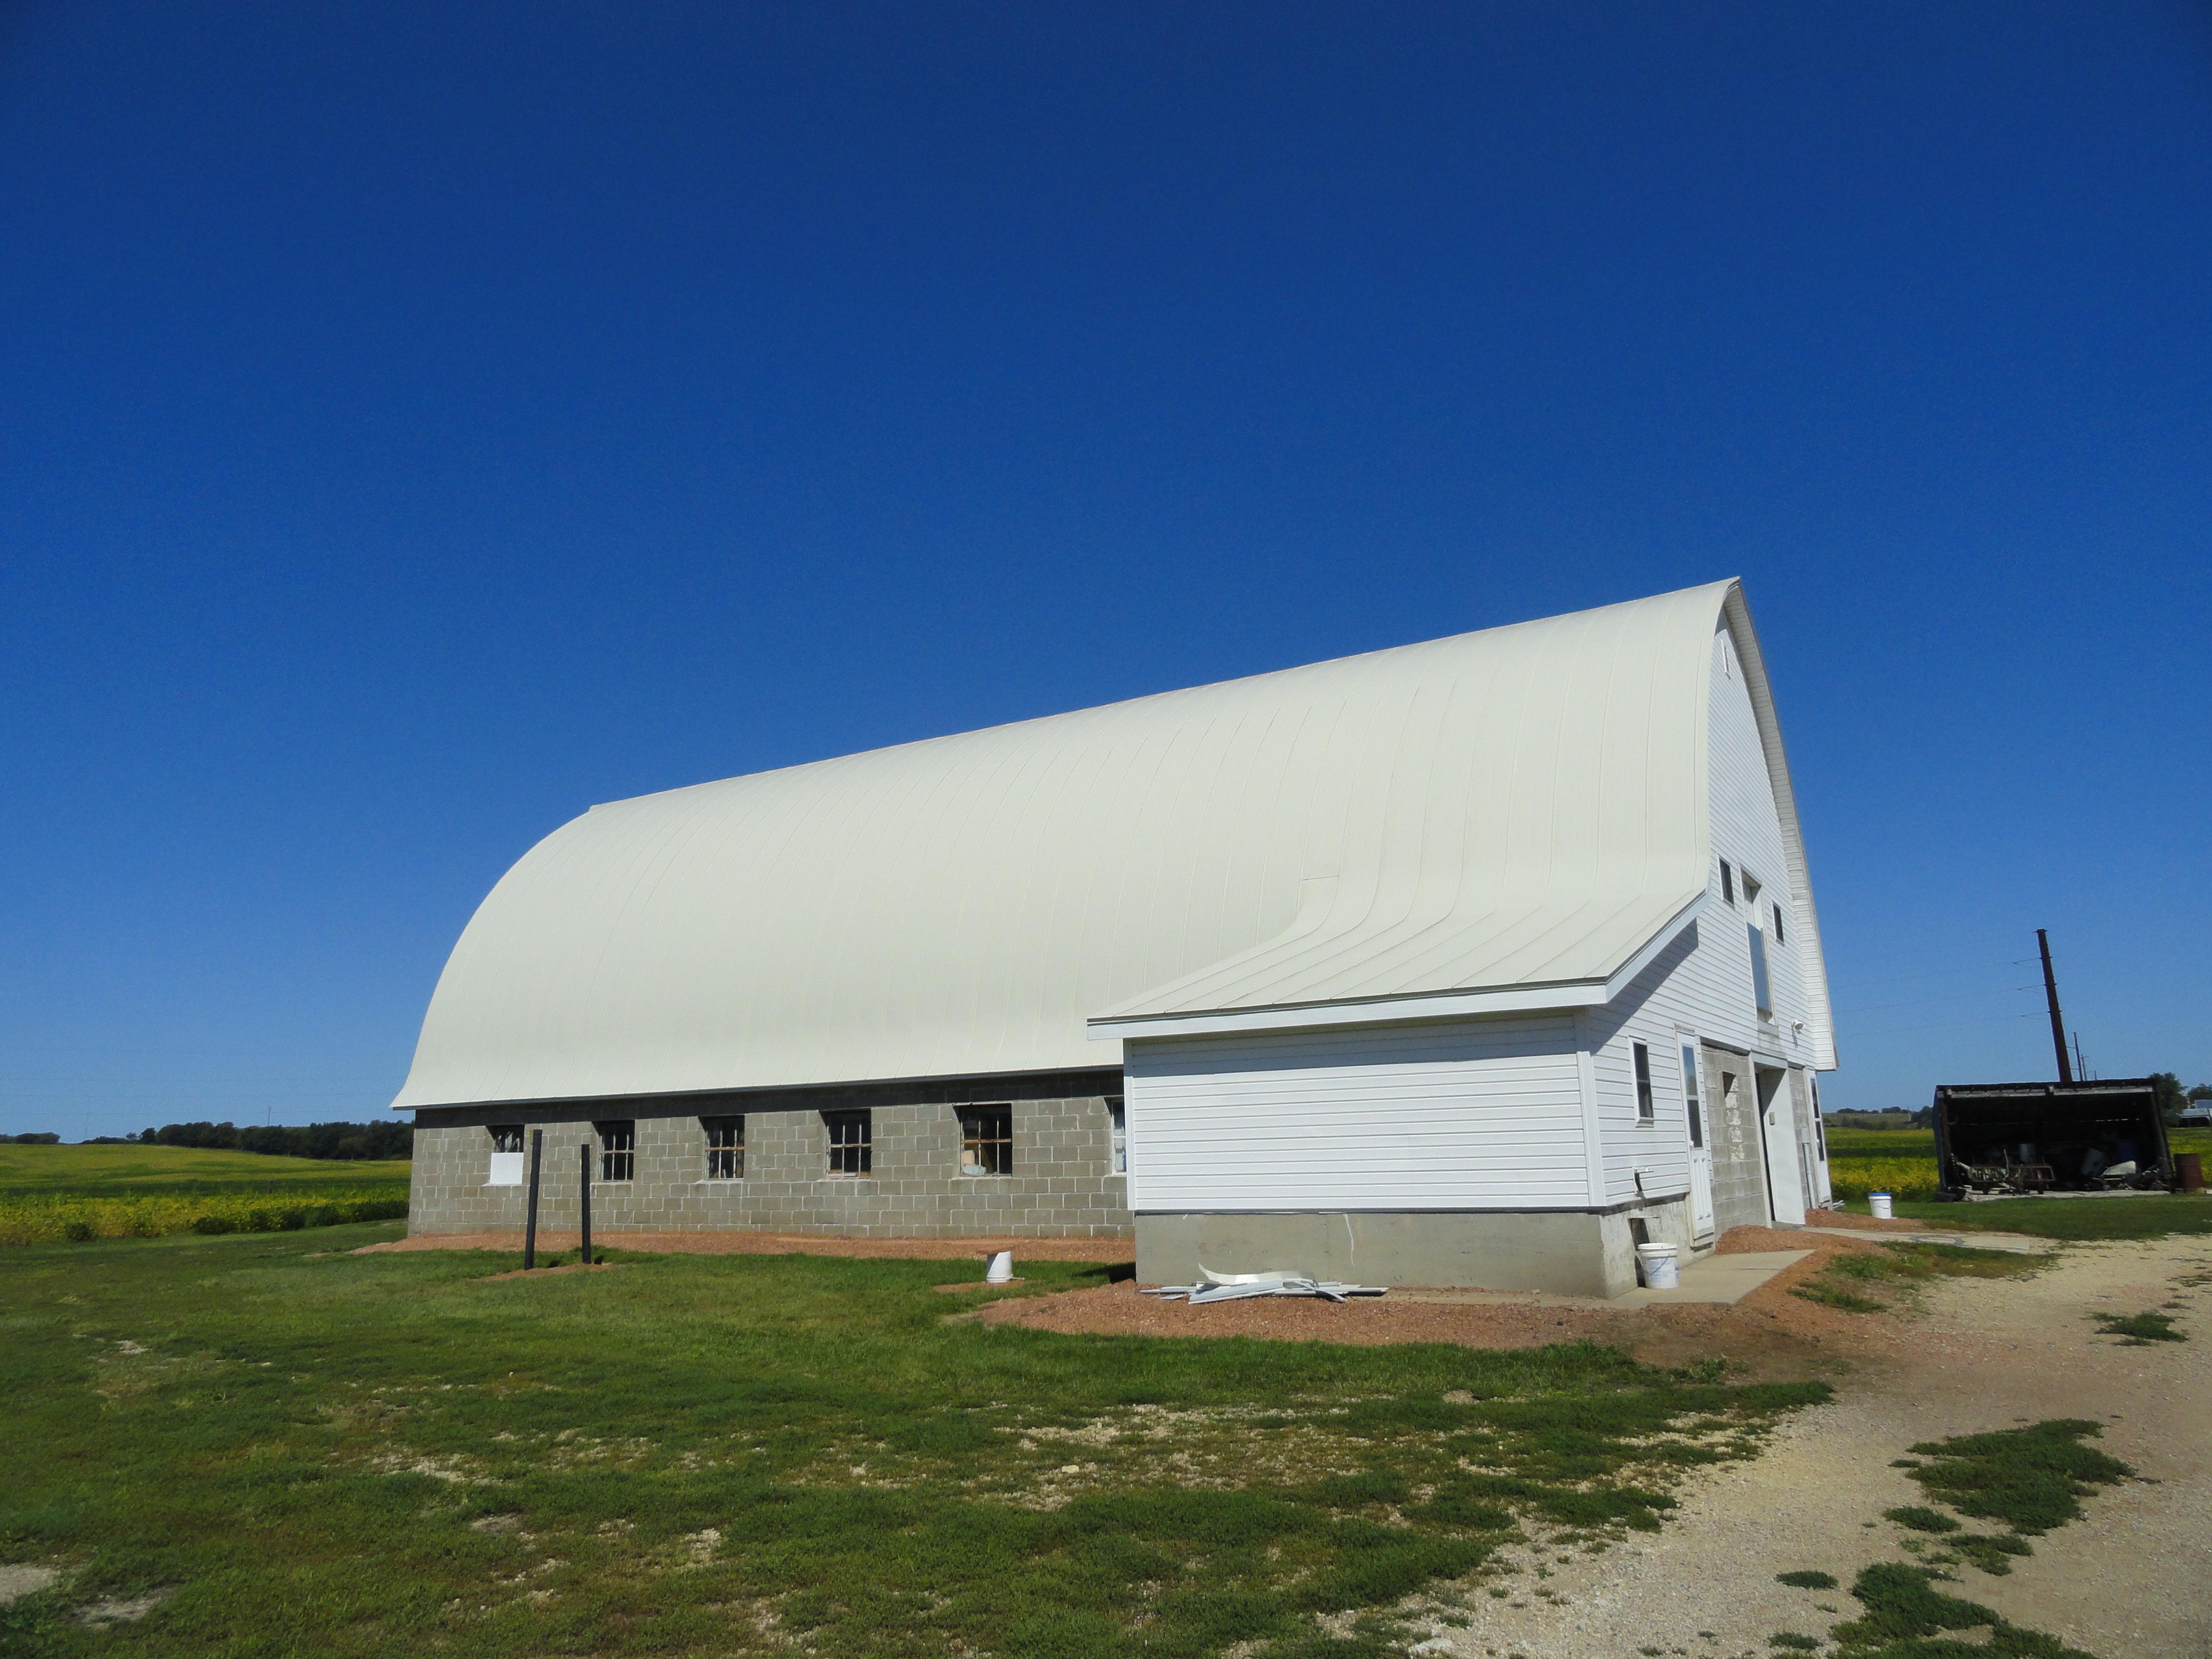 gothic barn standing seam double lock sheet metal roofing bone white agricultural culpitt wisconsin minnesota illinois iowa north dakota